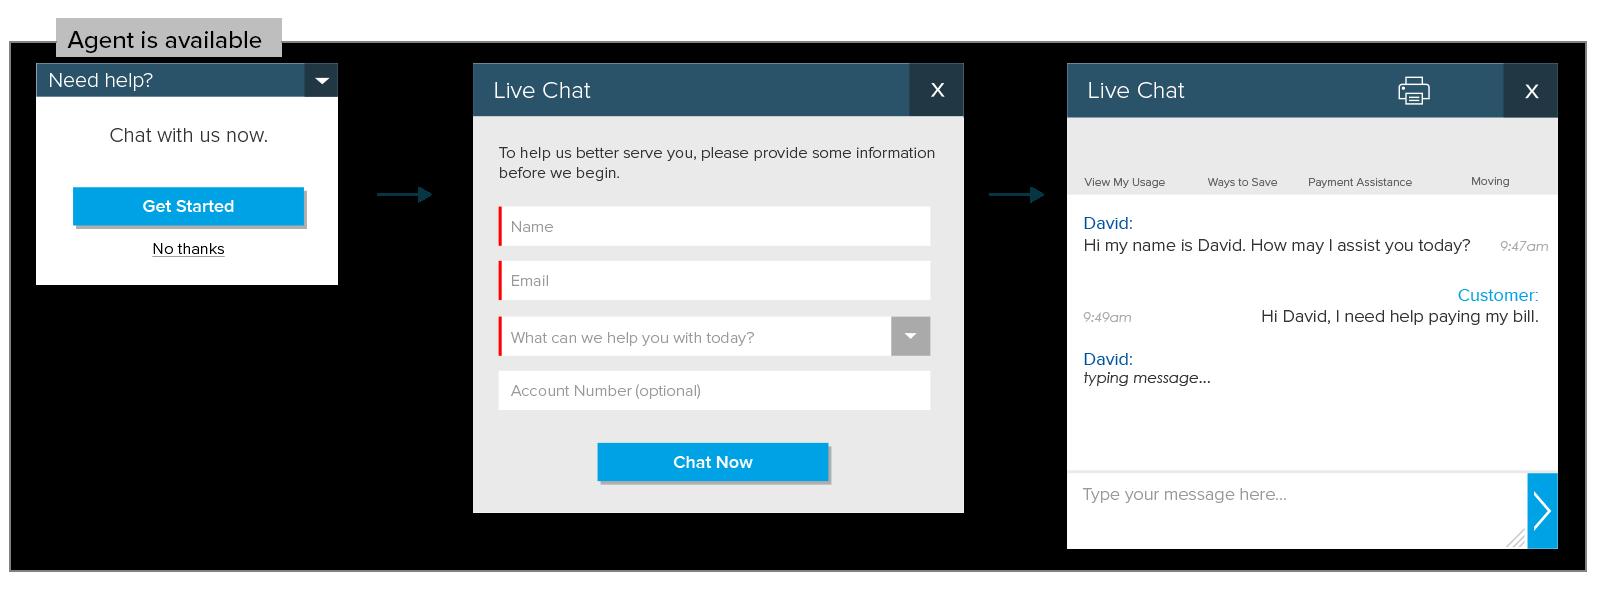 Live Chat - UX/UI Design